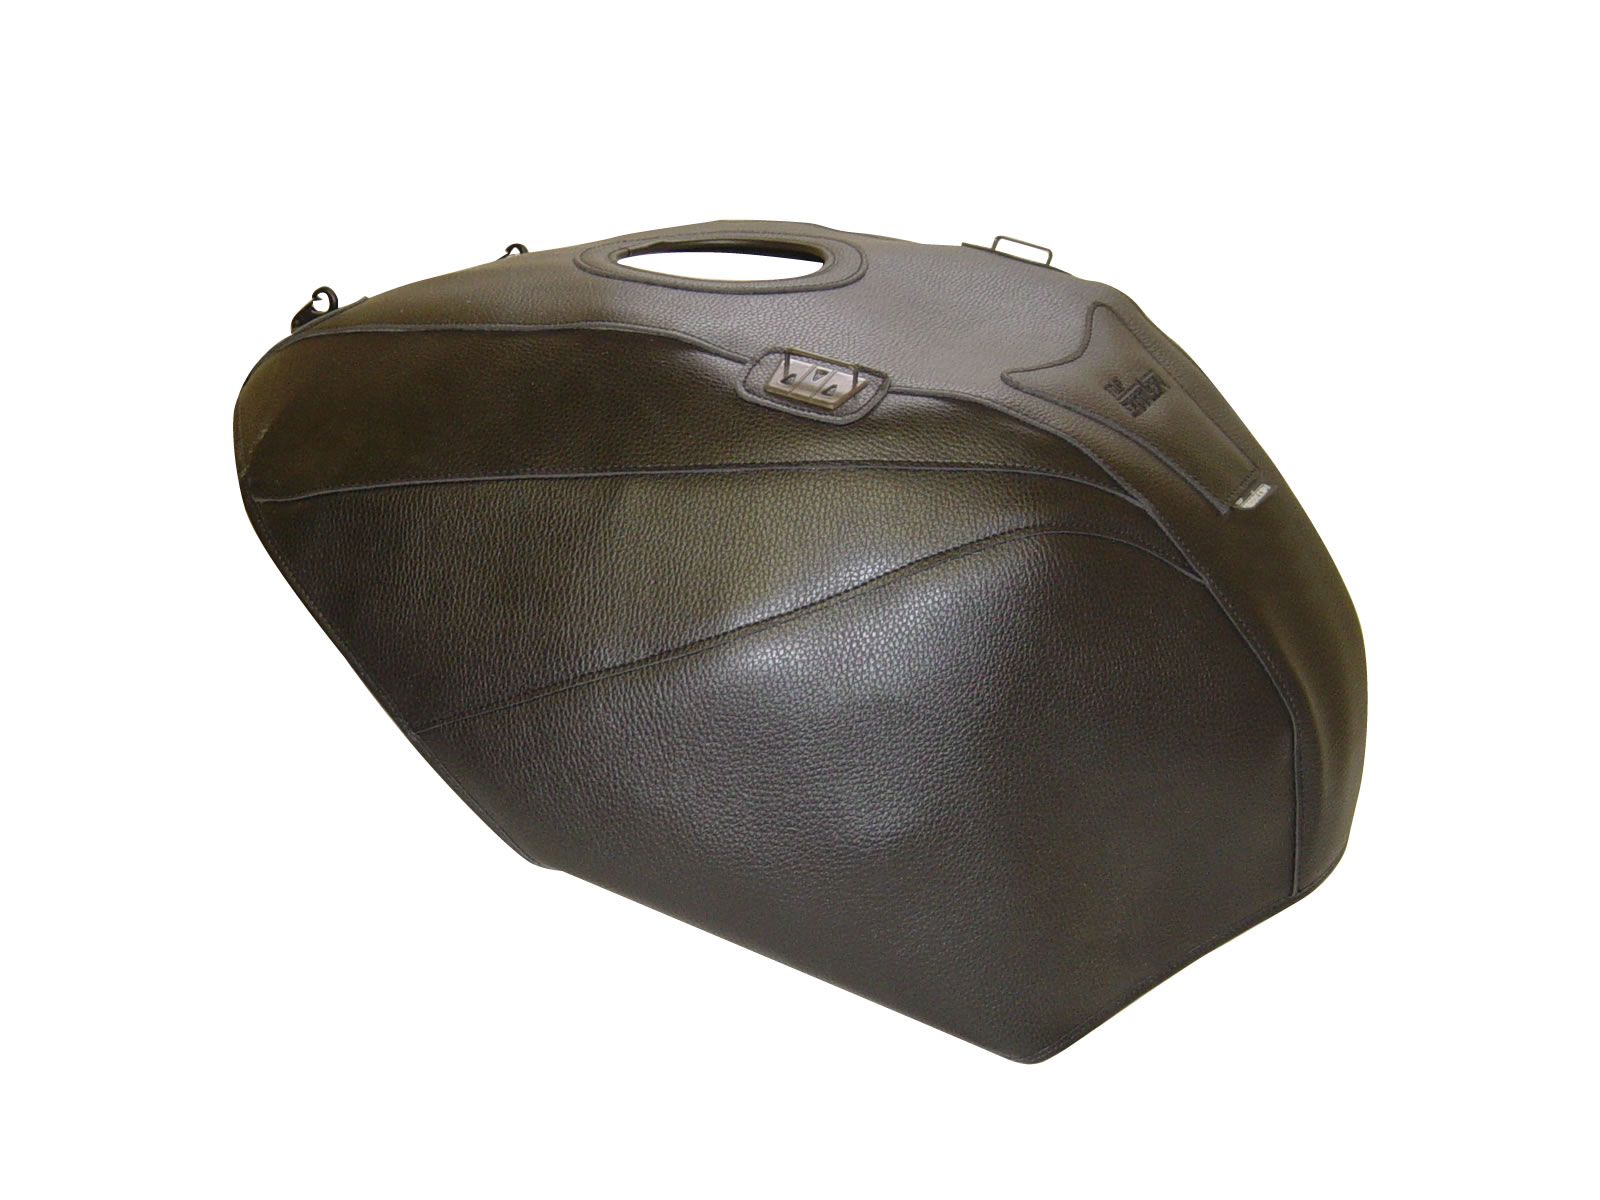 Capa de depósito TPR2716 - HONDA PAN EUROPEAN ST 1300 [≥ 2002]